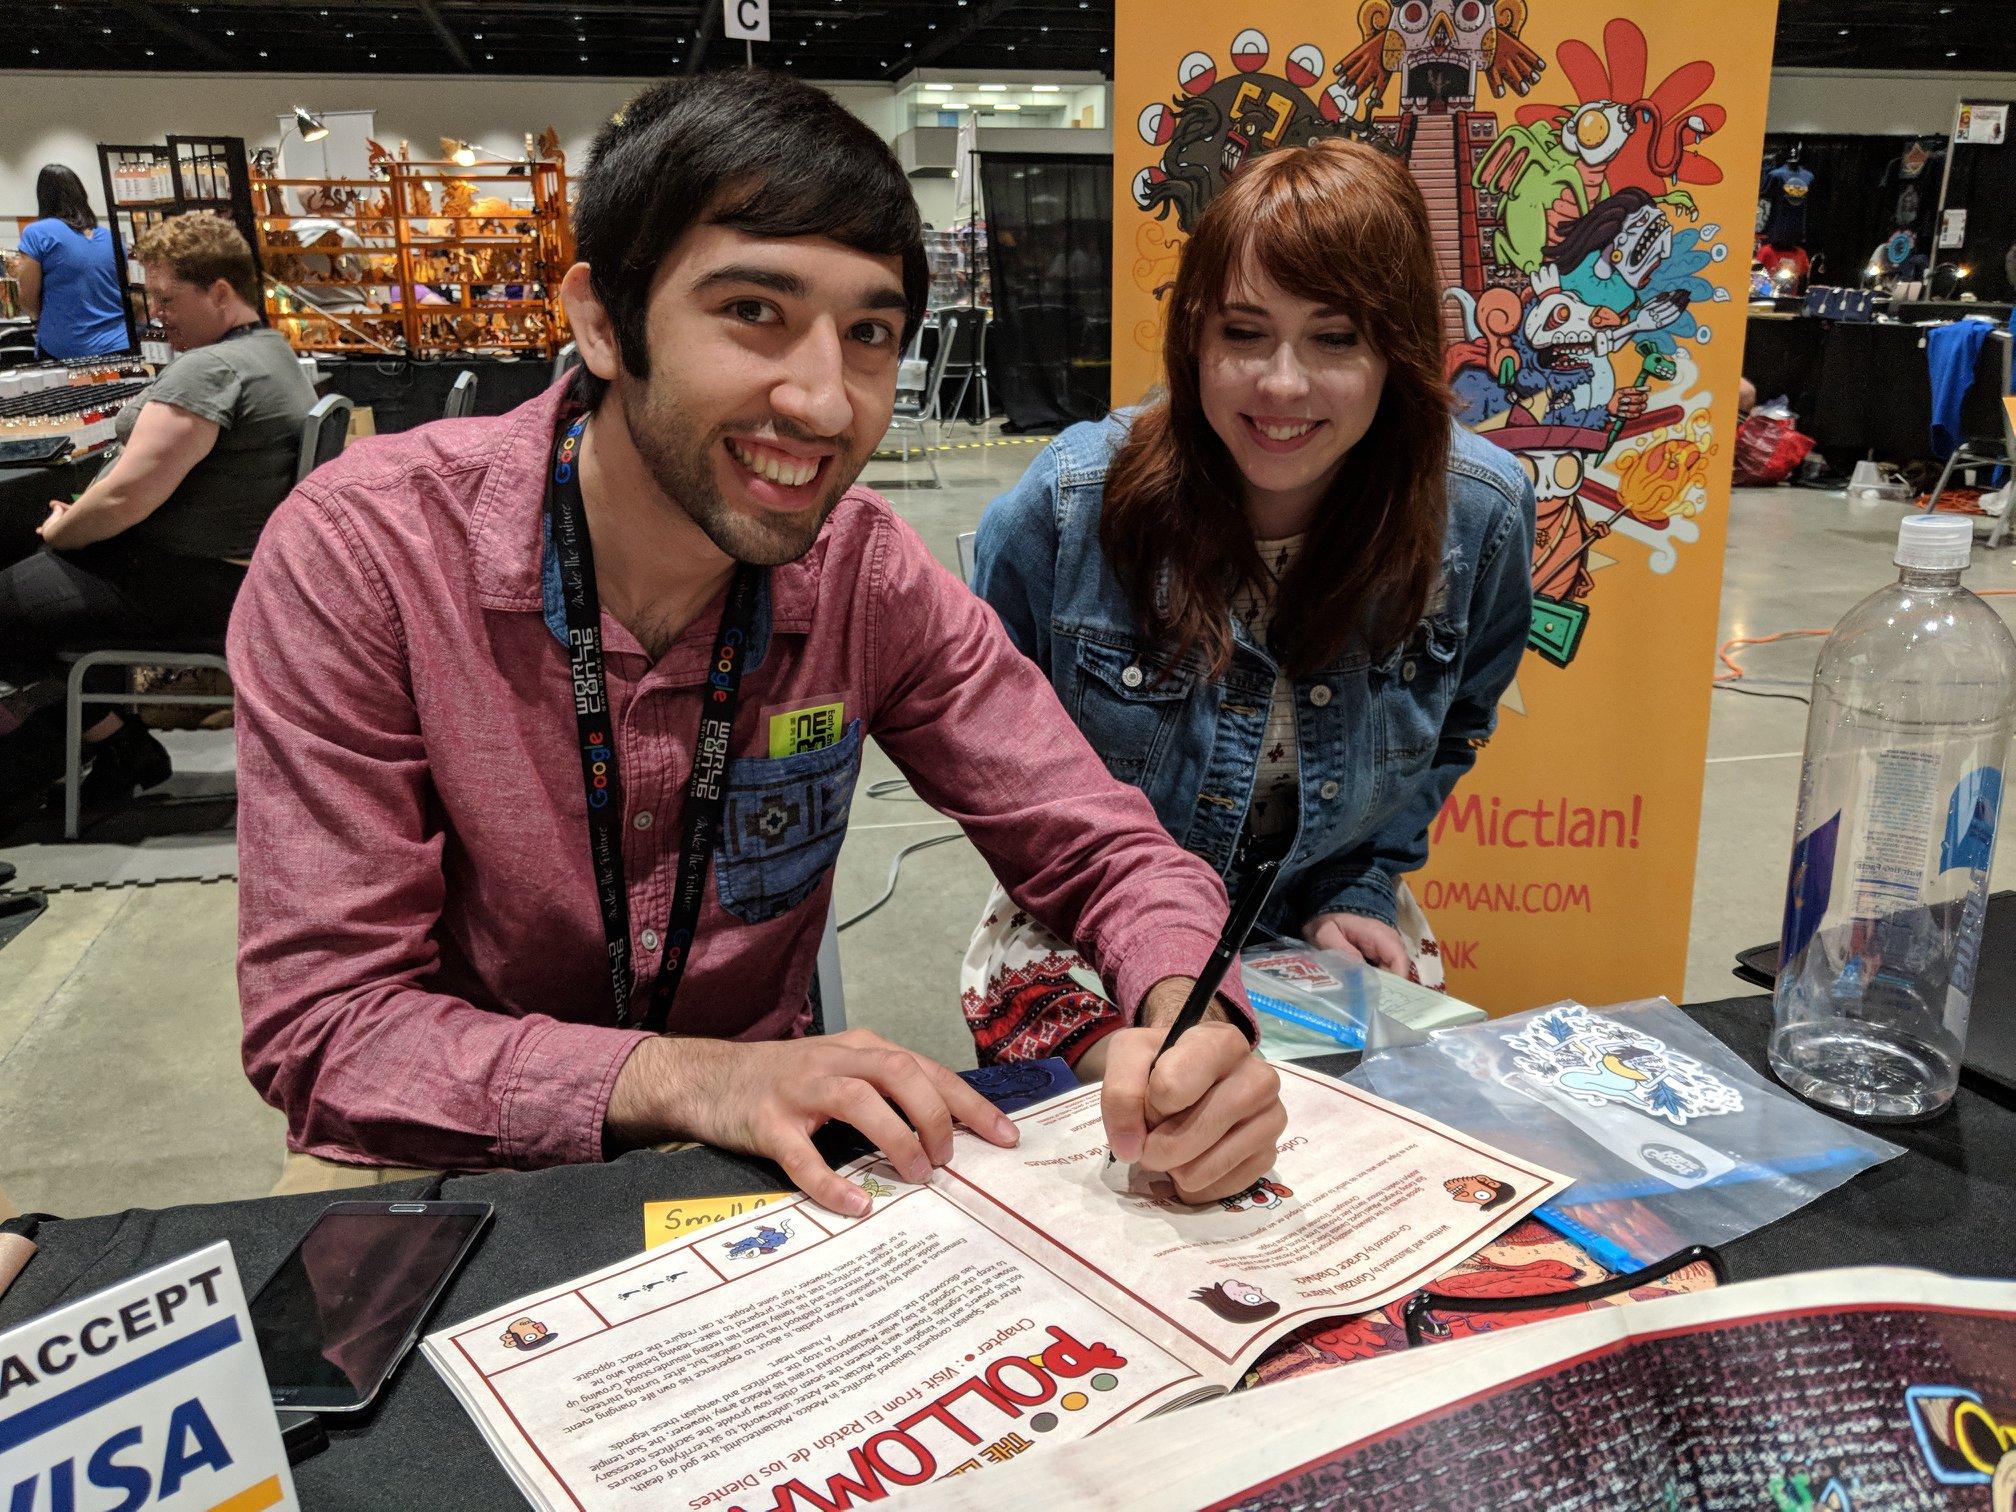 Gonzalo Alvarez signing a Polloman book (Sent by Gonzalo Alvarez; photo by Dianita Ceron)